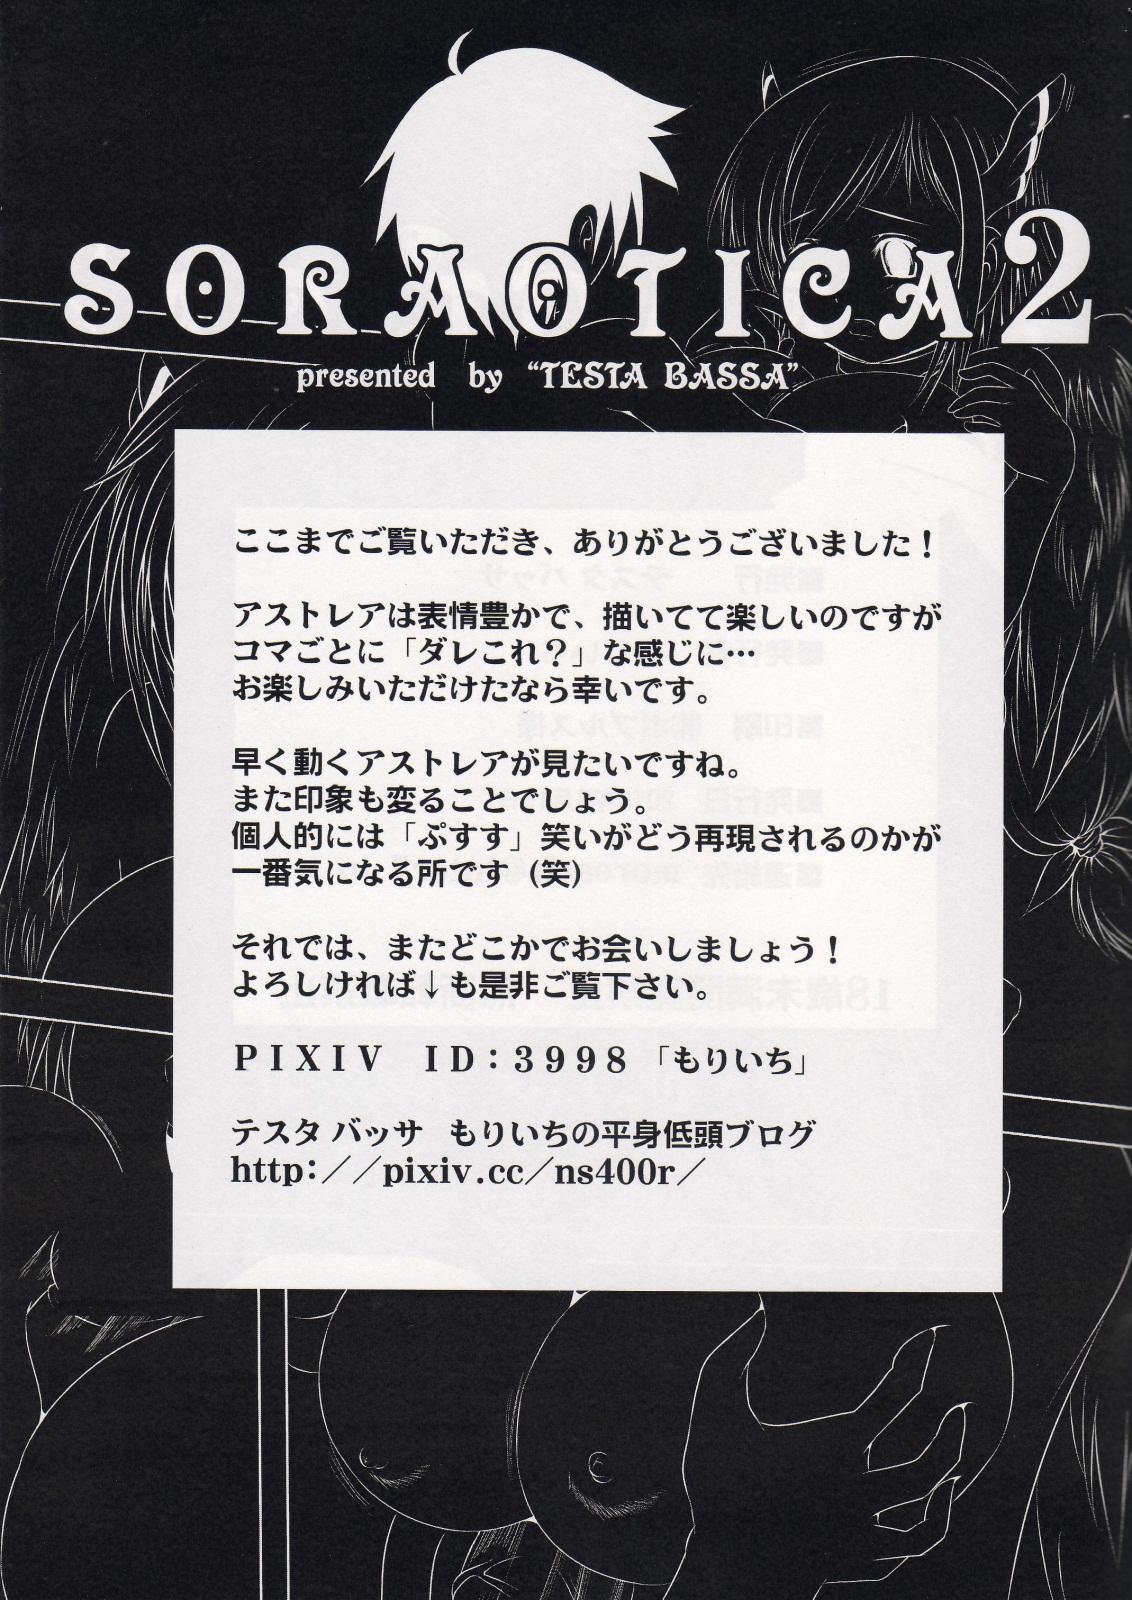 Soraotica 2 19